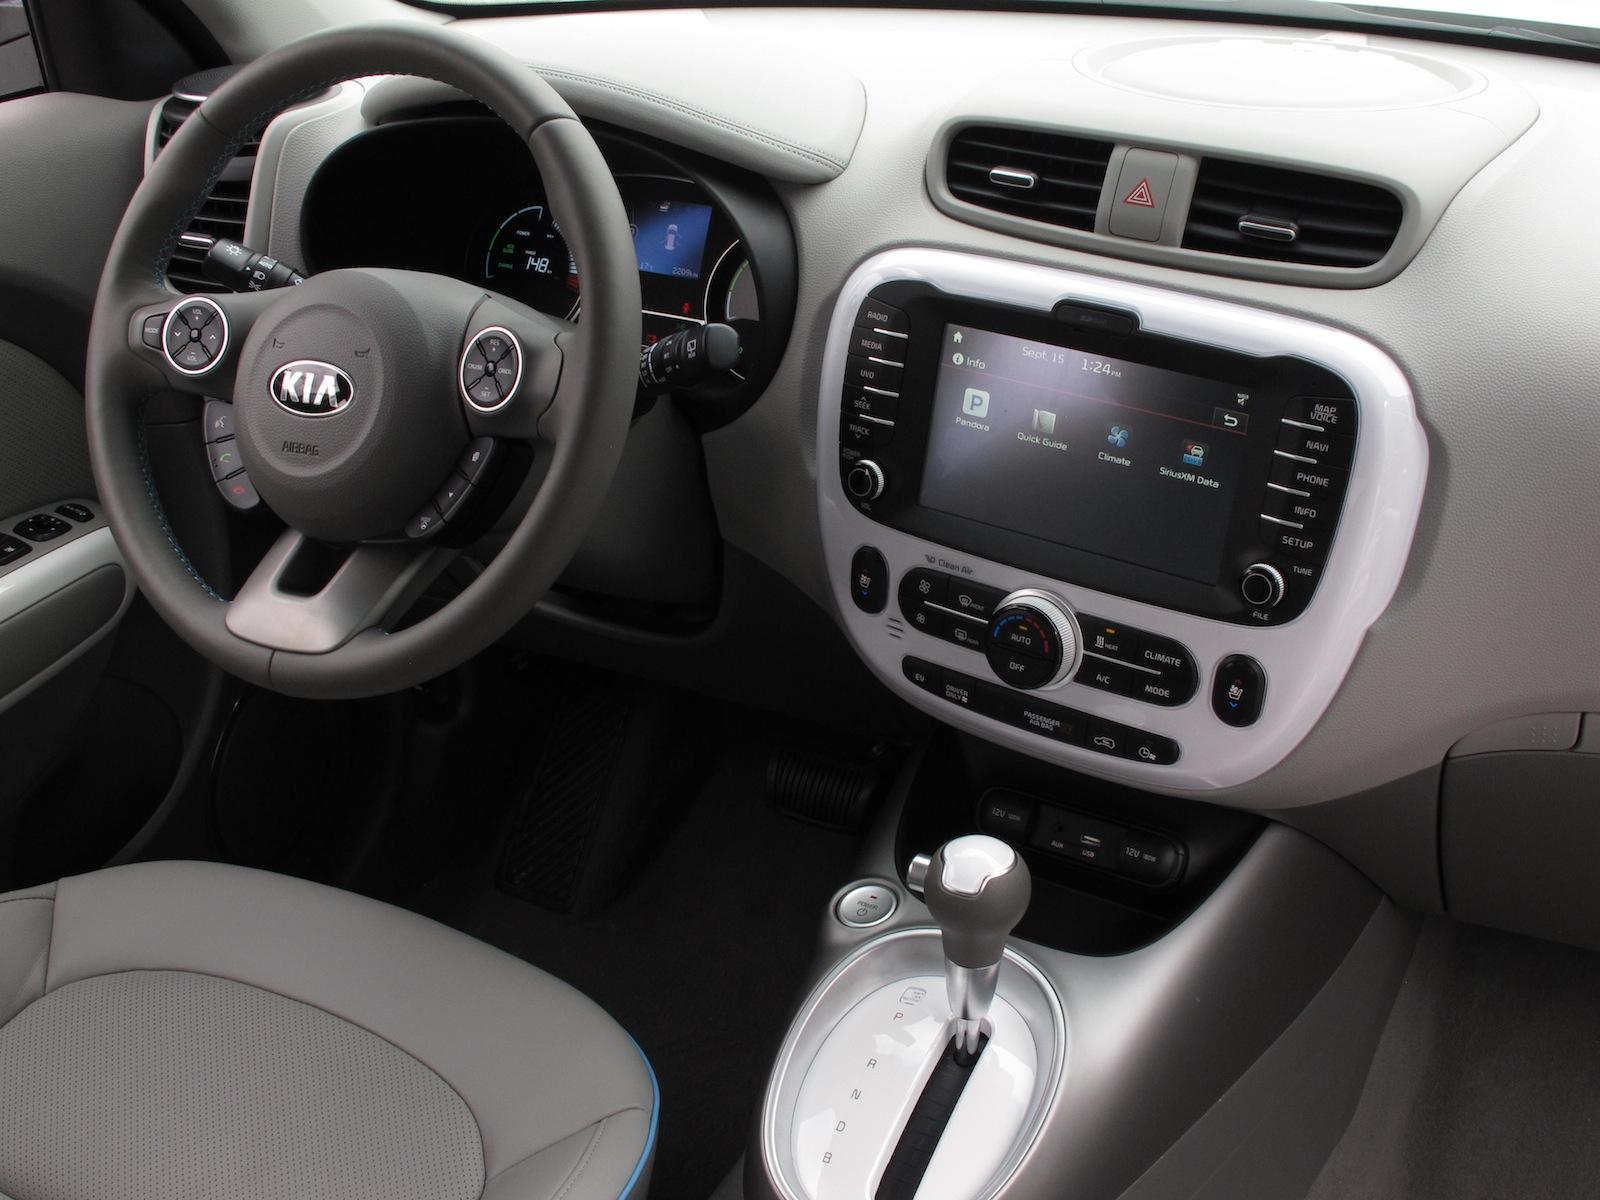 Kia Soul Ev >> 2015 Kia Soul EV Quick Look - Cars, Photos, Test Drives, and Reviews | Canadian Auto Review